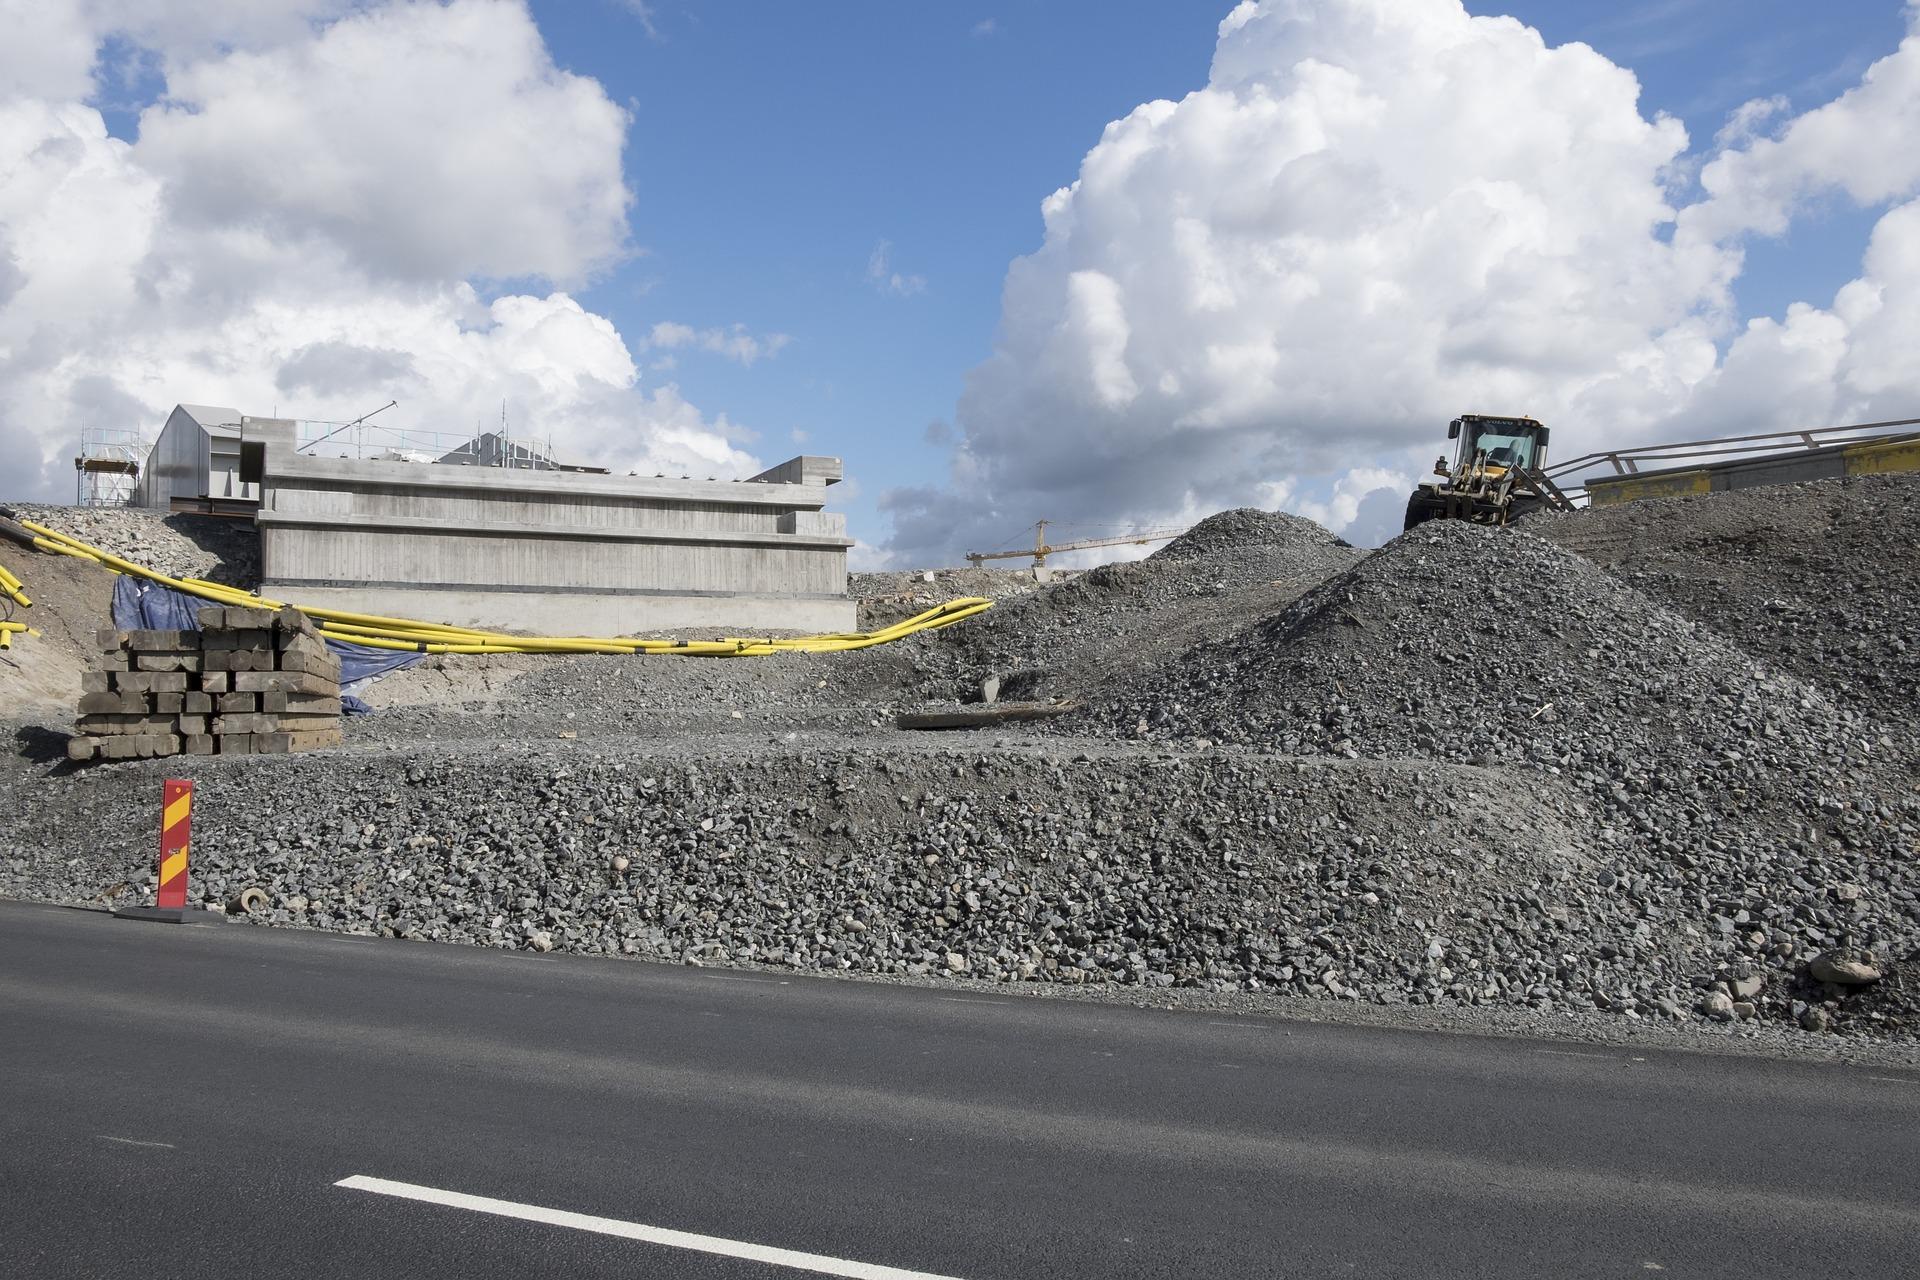 Jacksons Gap Clay & Gravel | Jacksons Gap, AL | Grading, Excavation, Aggregate Hauling